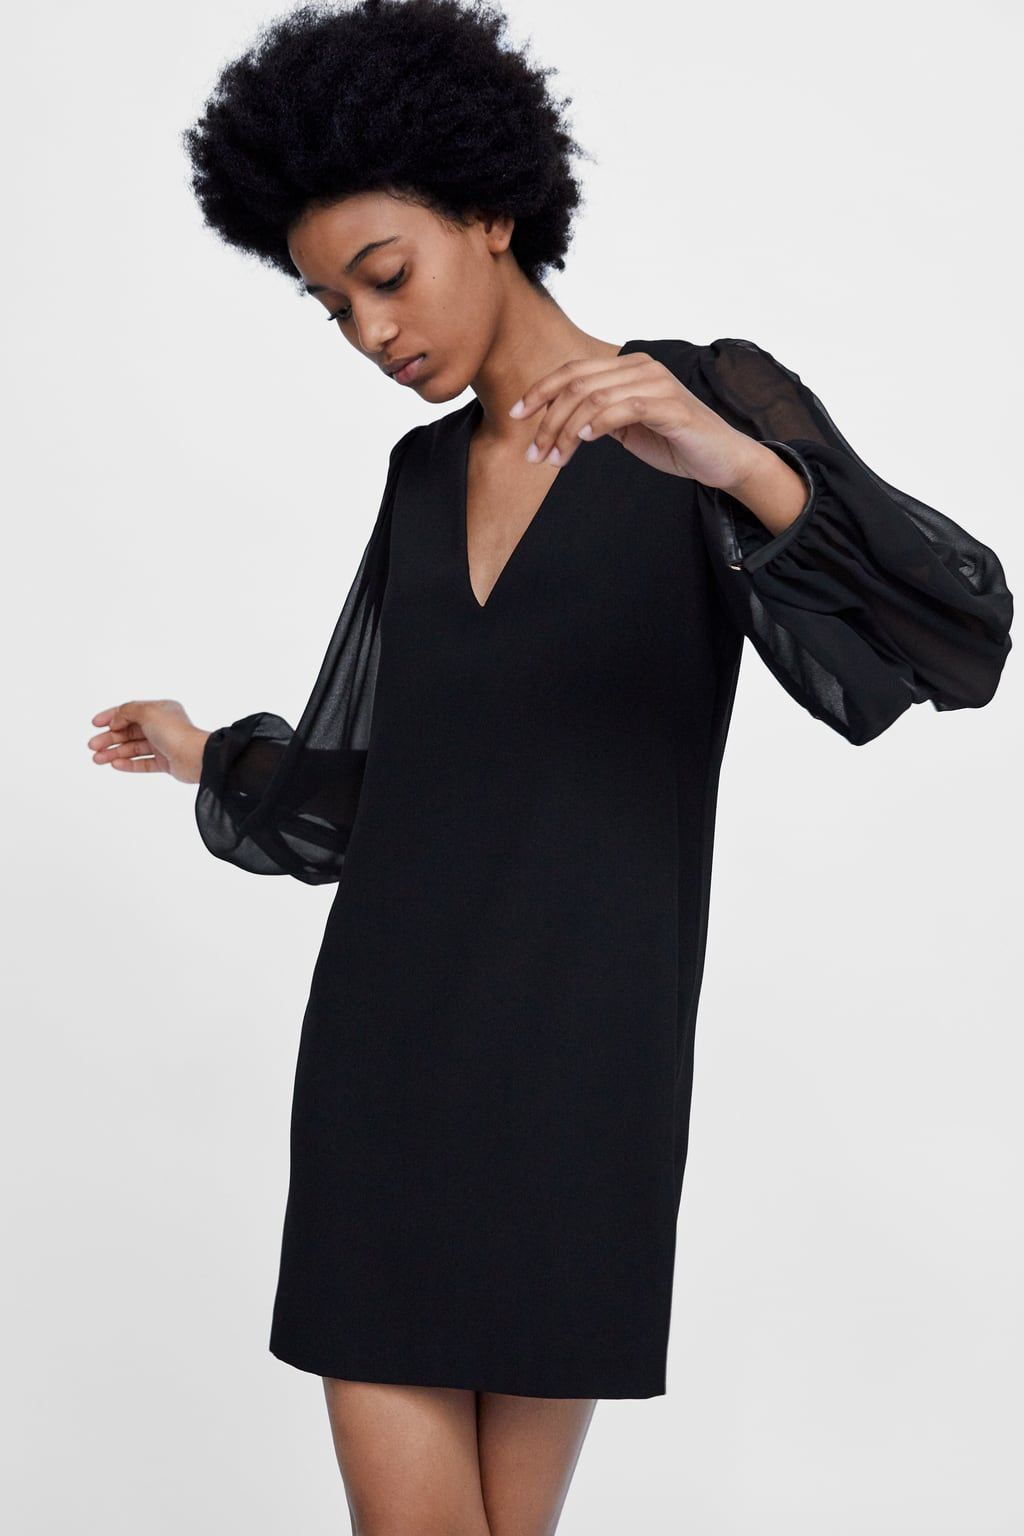 2 Courte ZaraParty DressesHoliday Robe Time De Image EIDH29